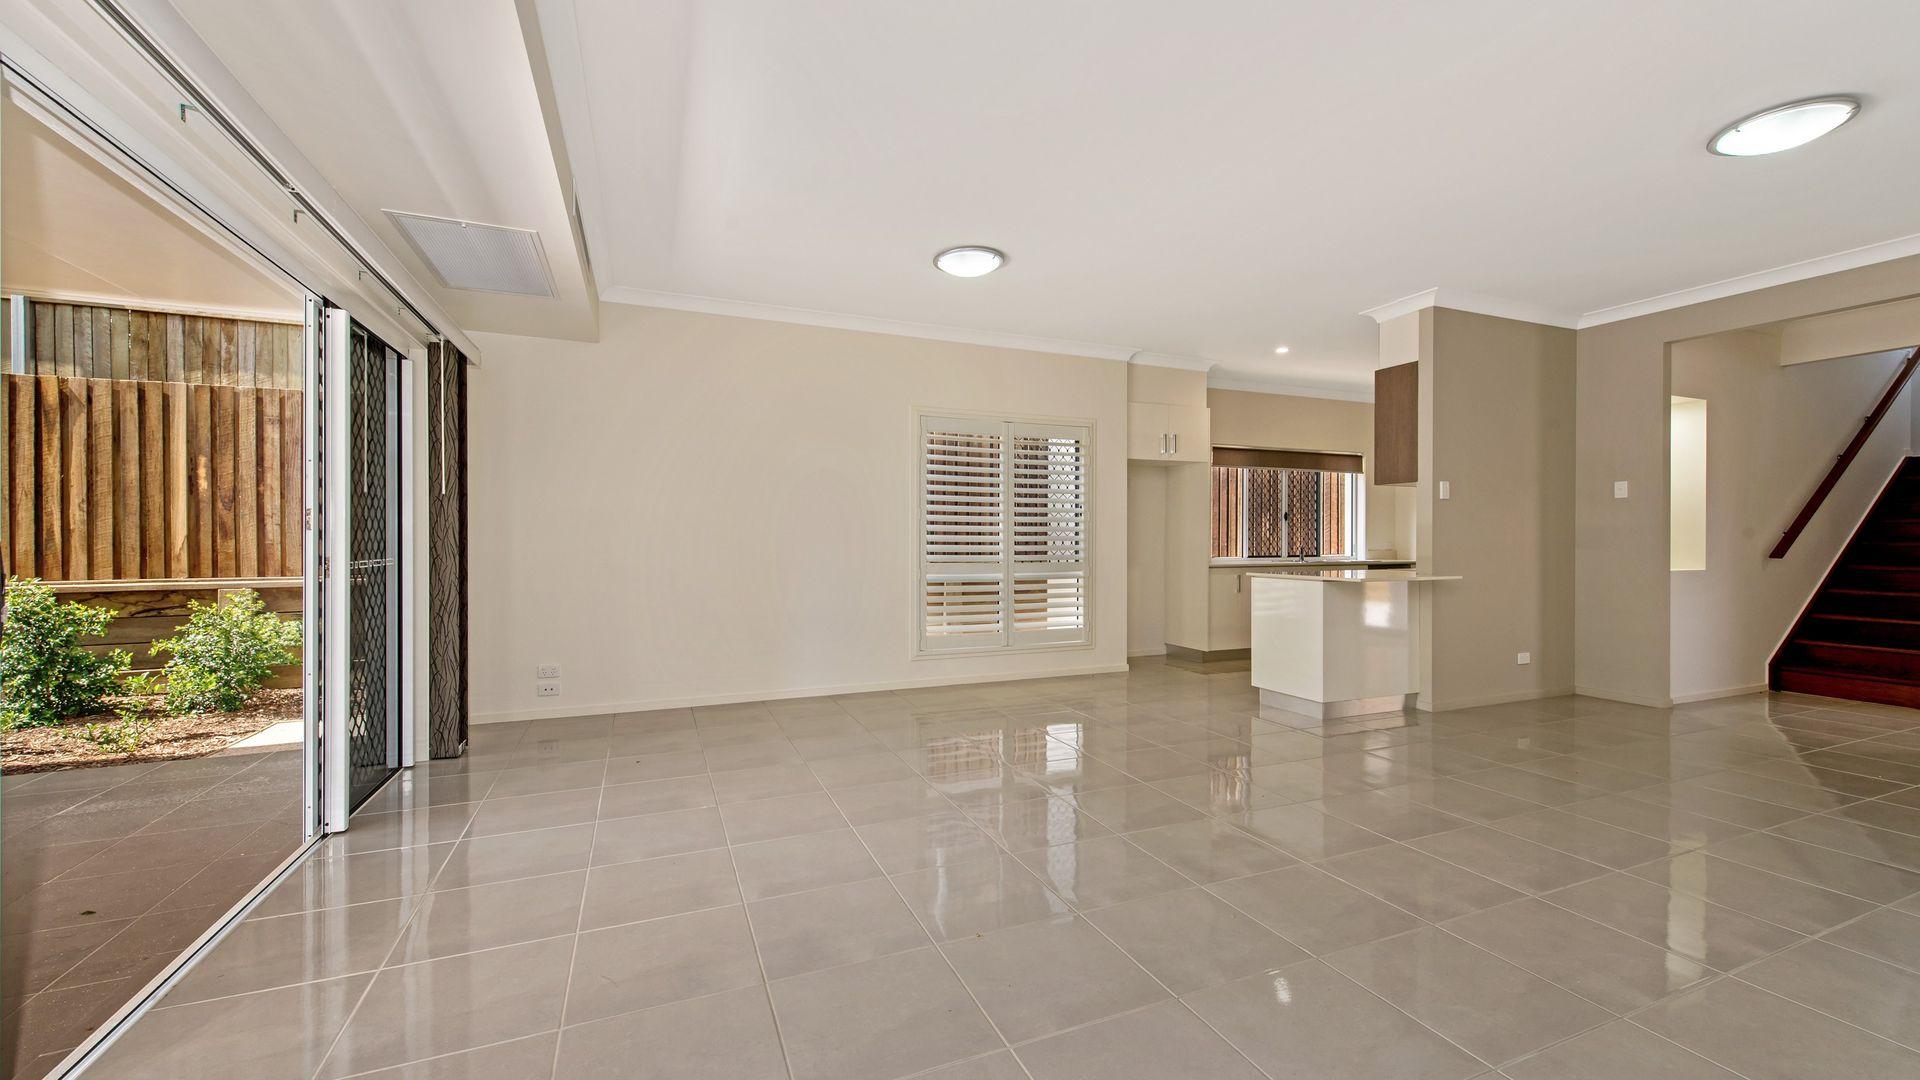 3/10 Burke Street, Rangeville QLD 4350, Image 1